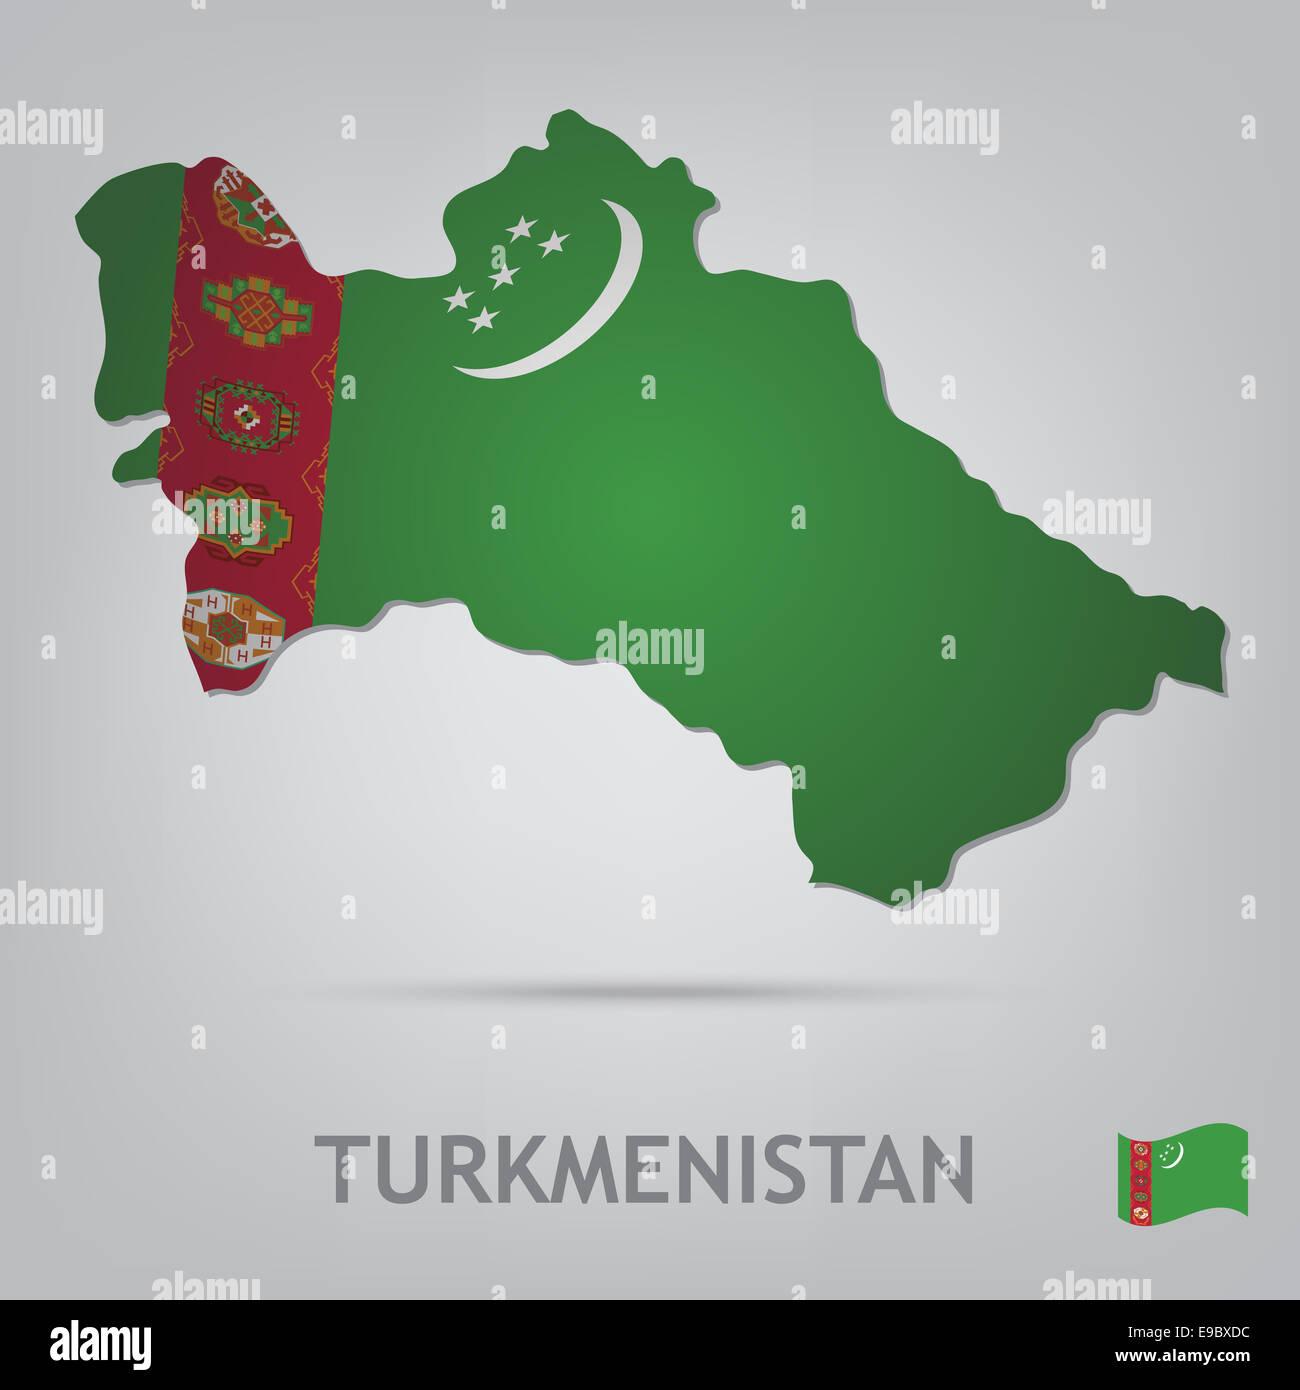 turkmenistan - Stock Image